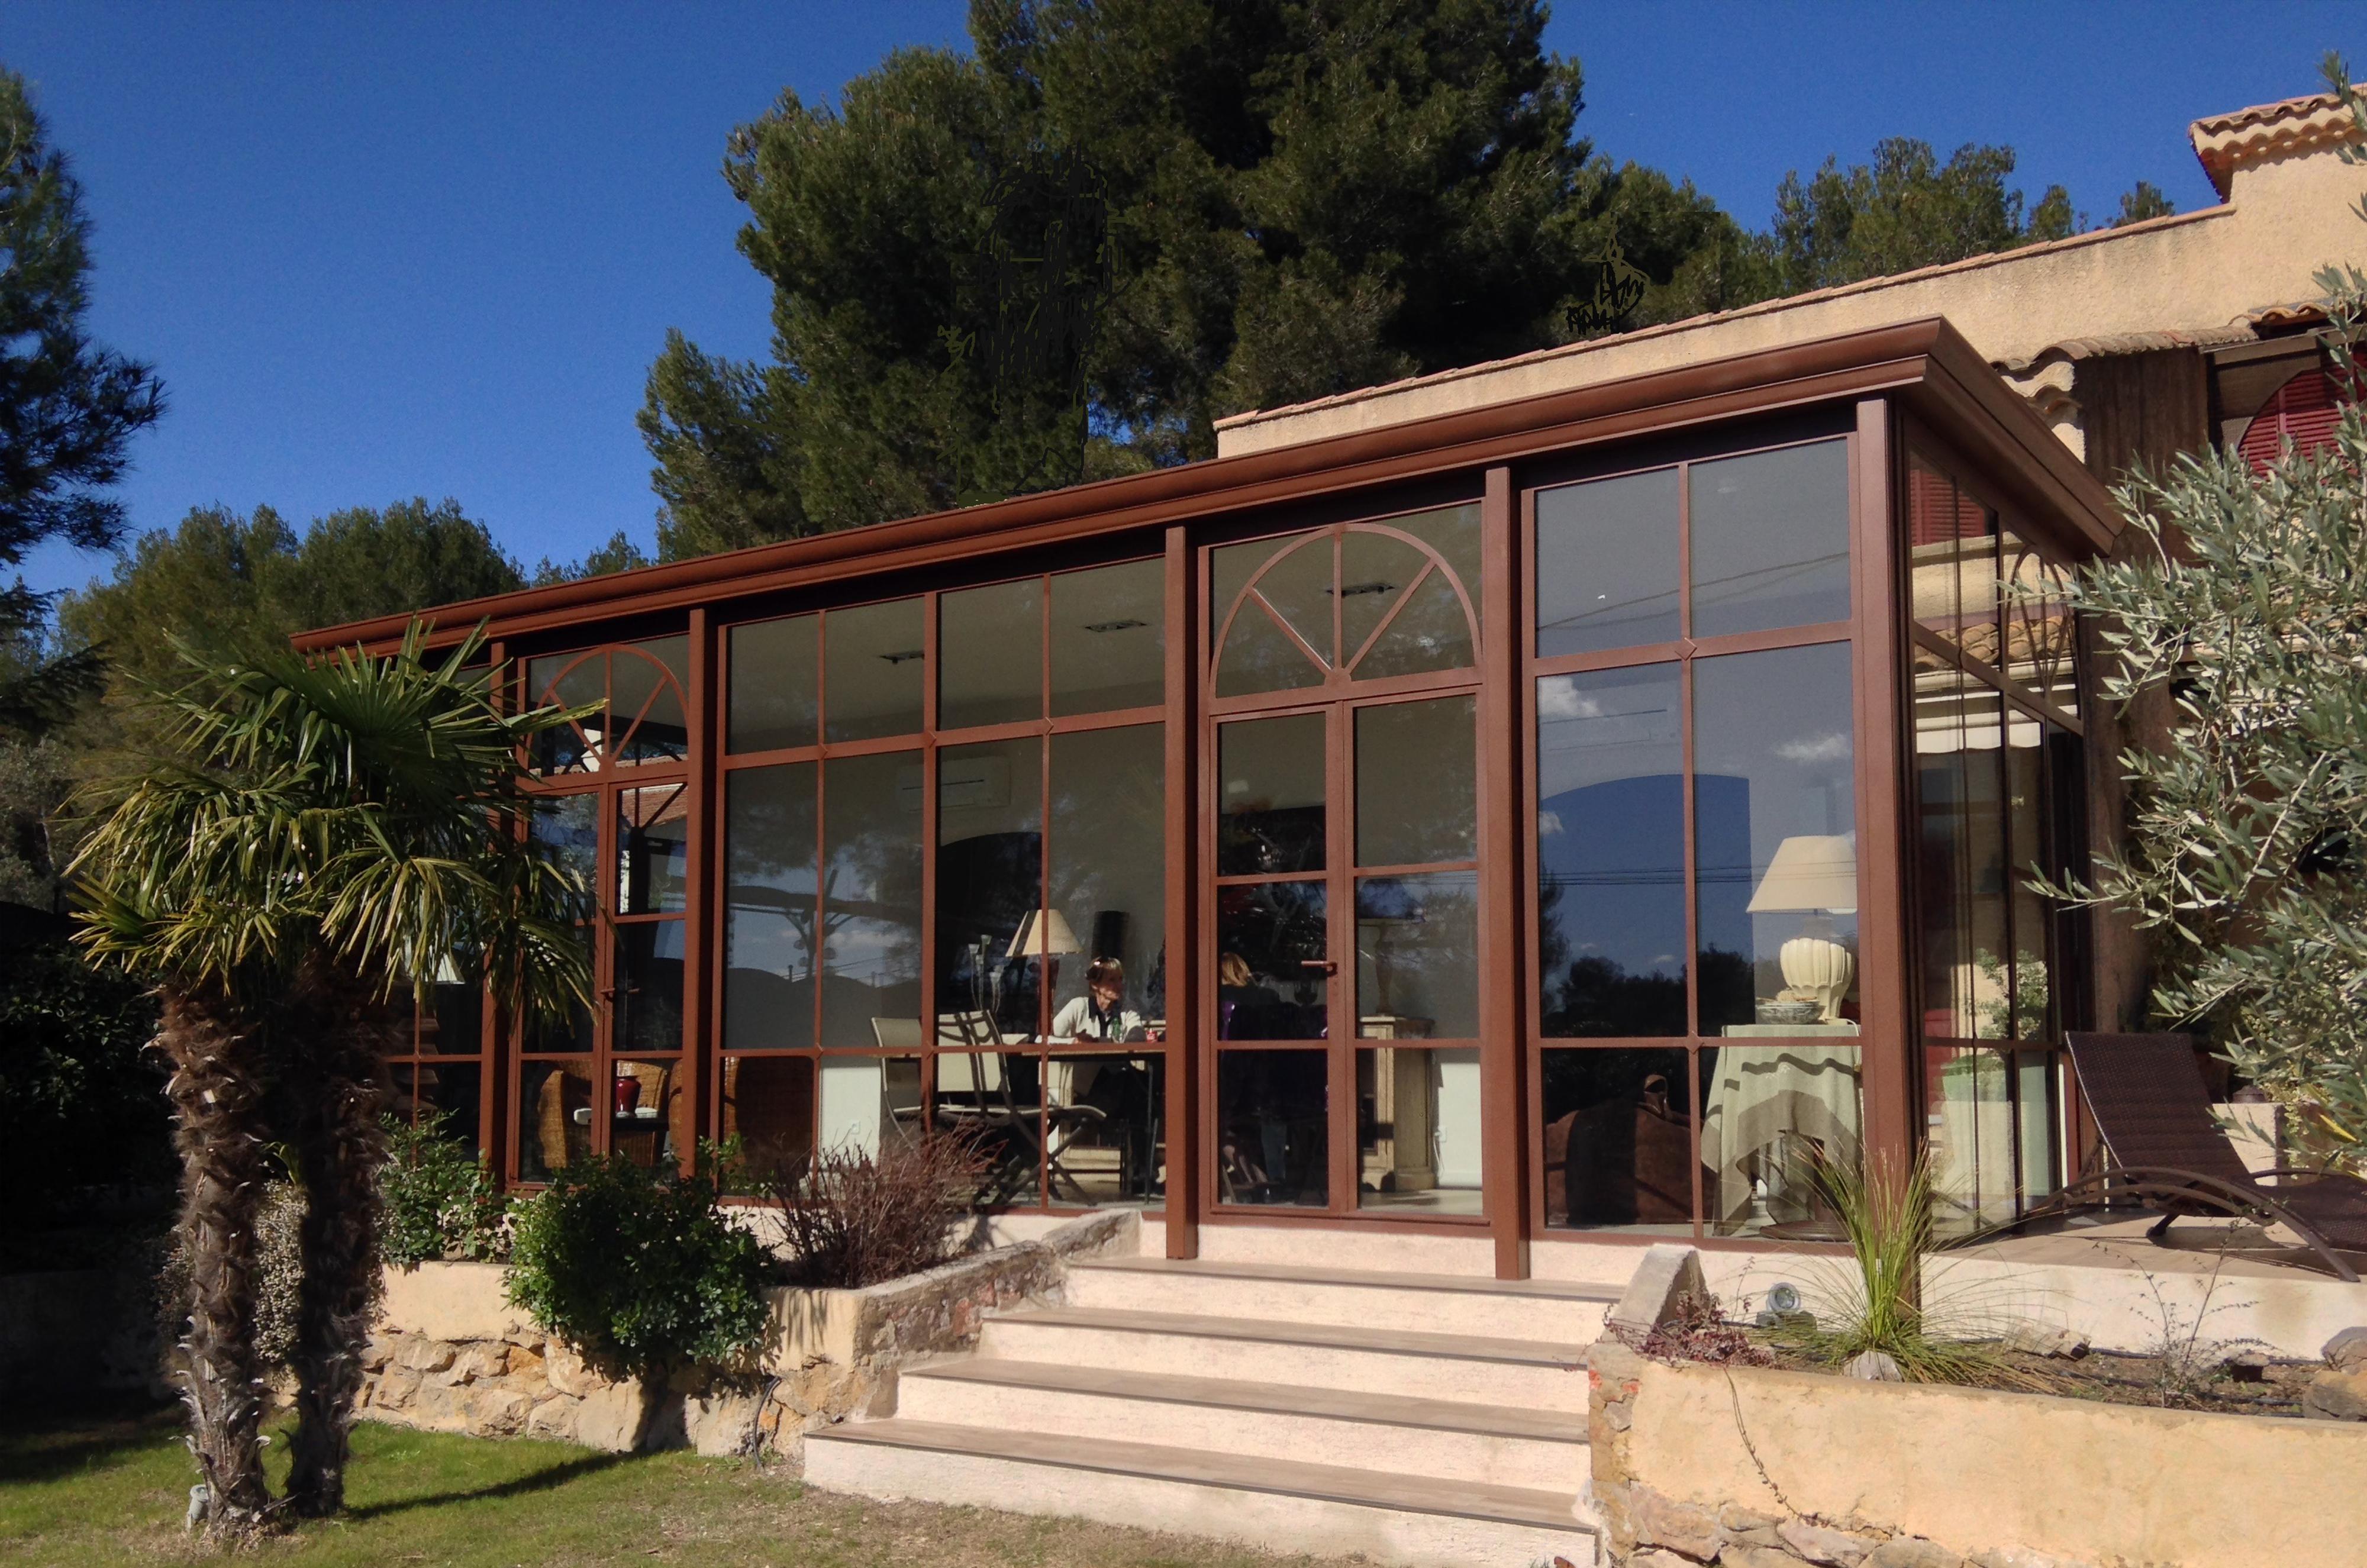 stunning jardin d hiver veranda ideas amazing house design. Black Bedroom Furniture Sets. Home Design Ideas